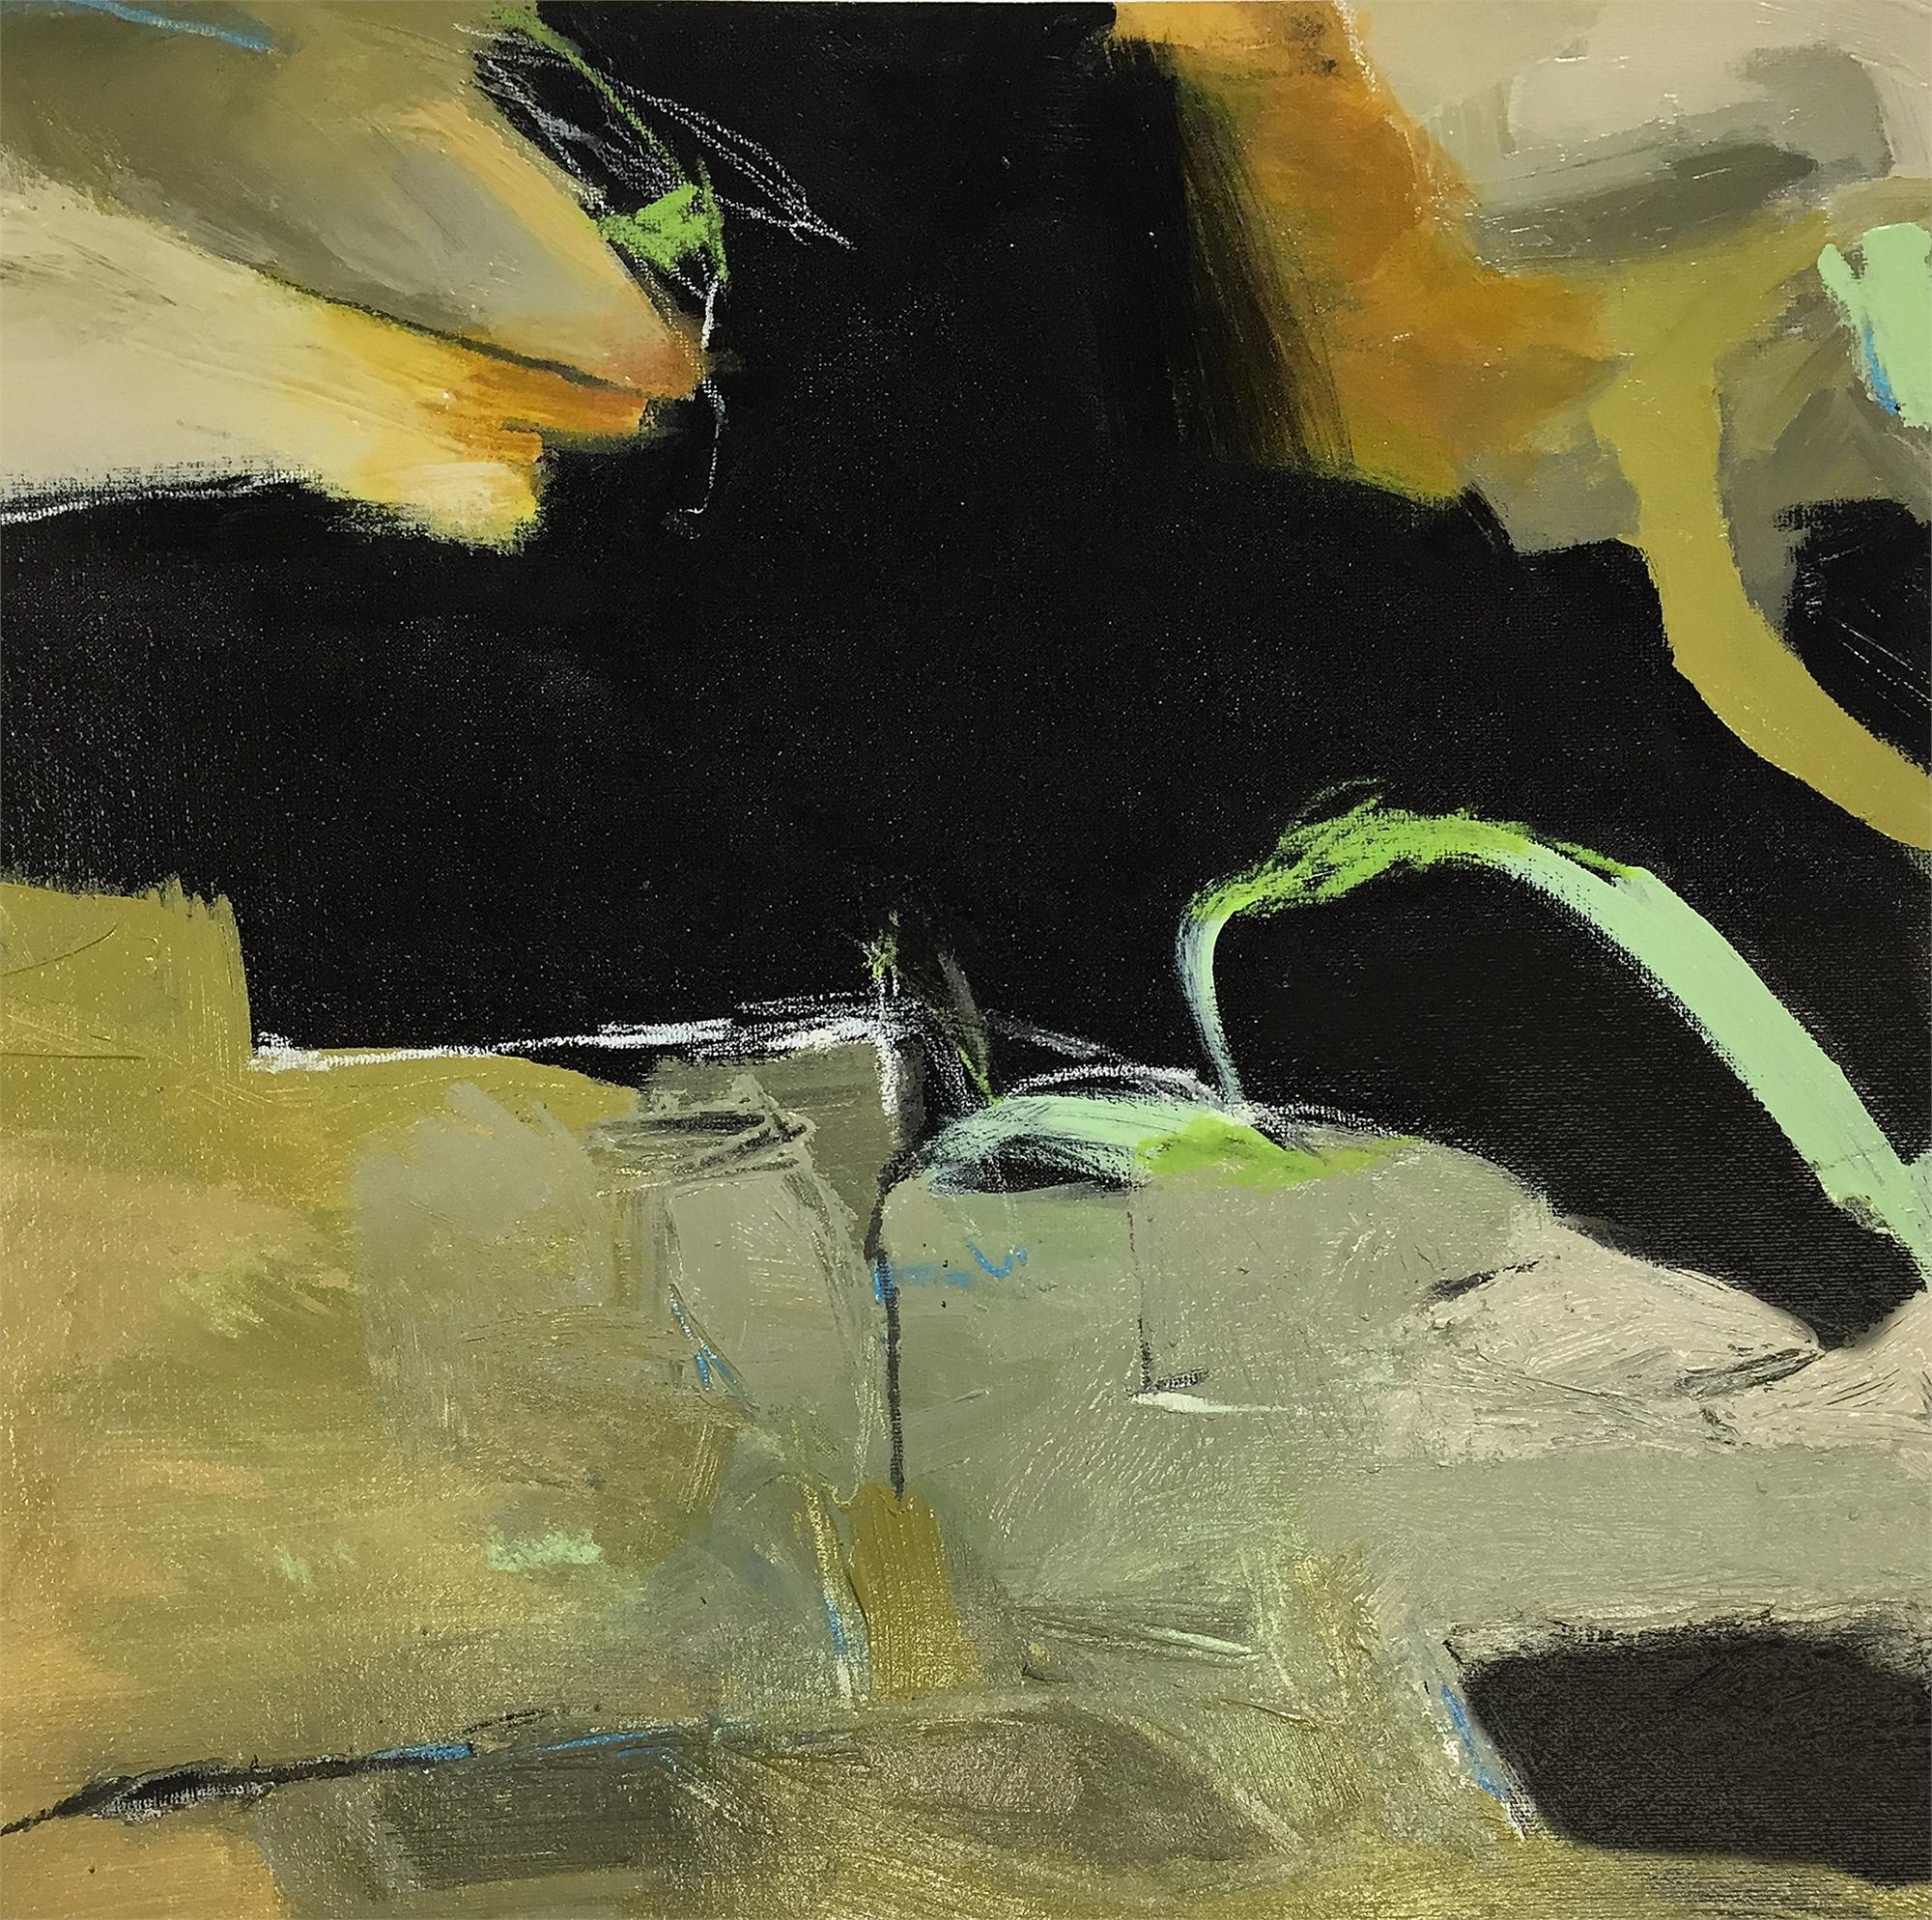 Untitled 198588 by Karen Roehl